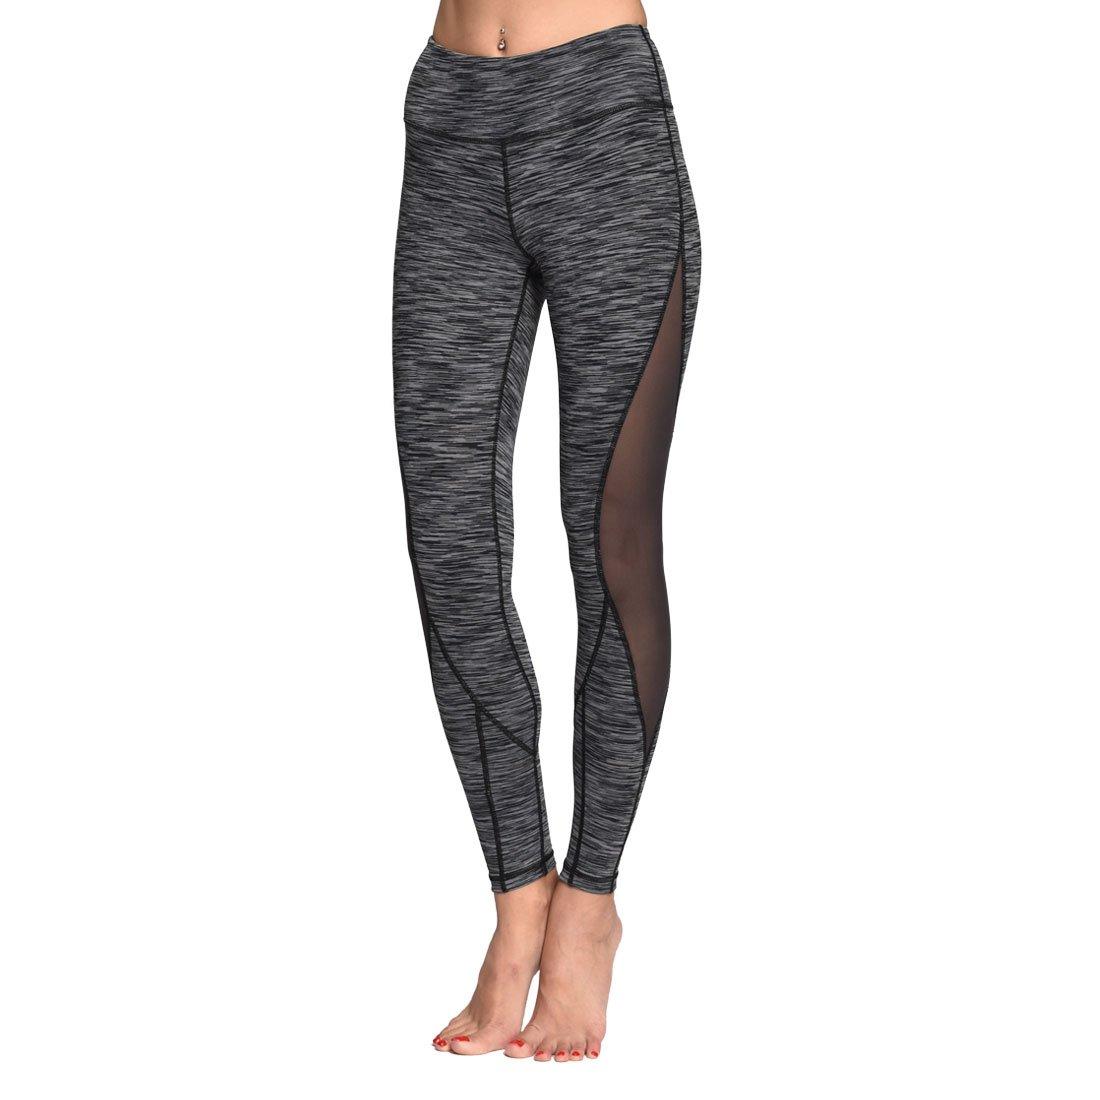 Anti-Muffin Top High Waist,Out Pocket//Hidden Pocket Chikool Womens Mesh Capri Yoga Pants